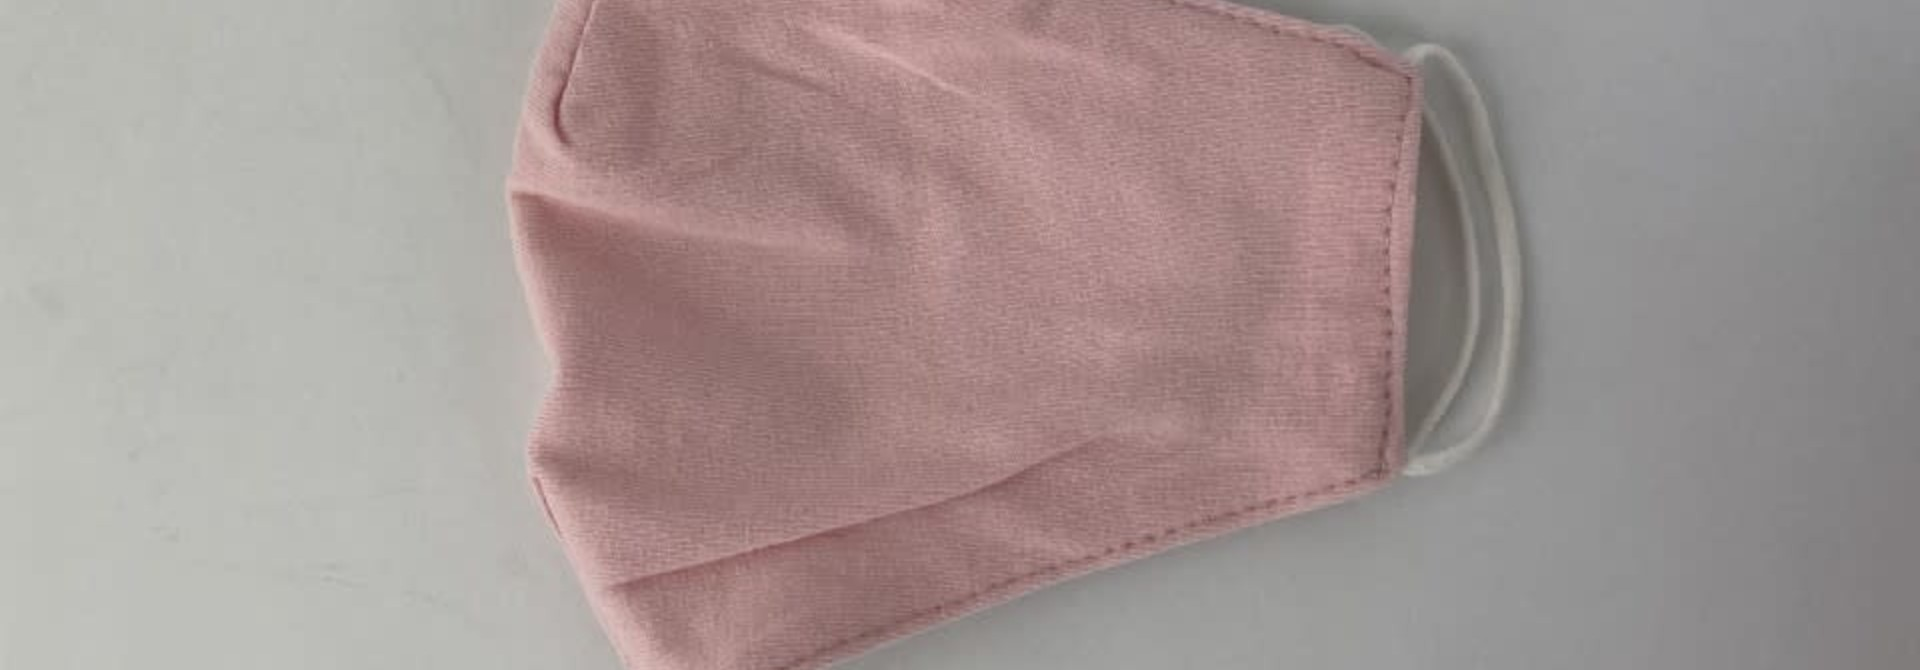 Vive cotton stretch face mask Pink